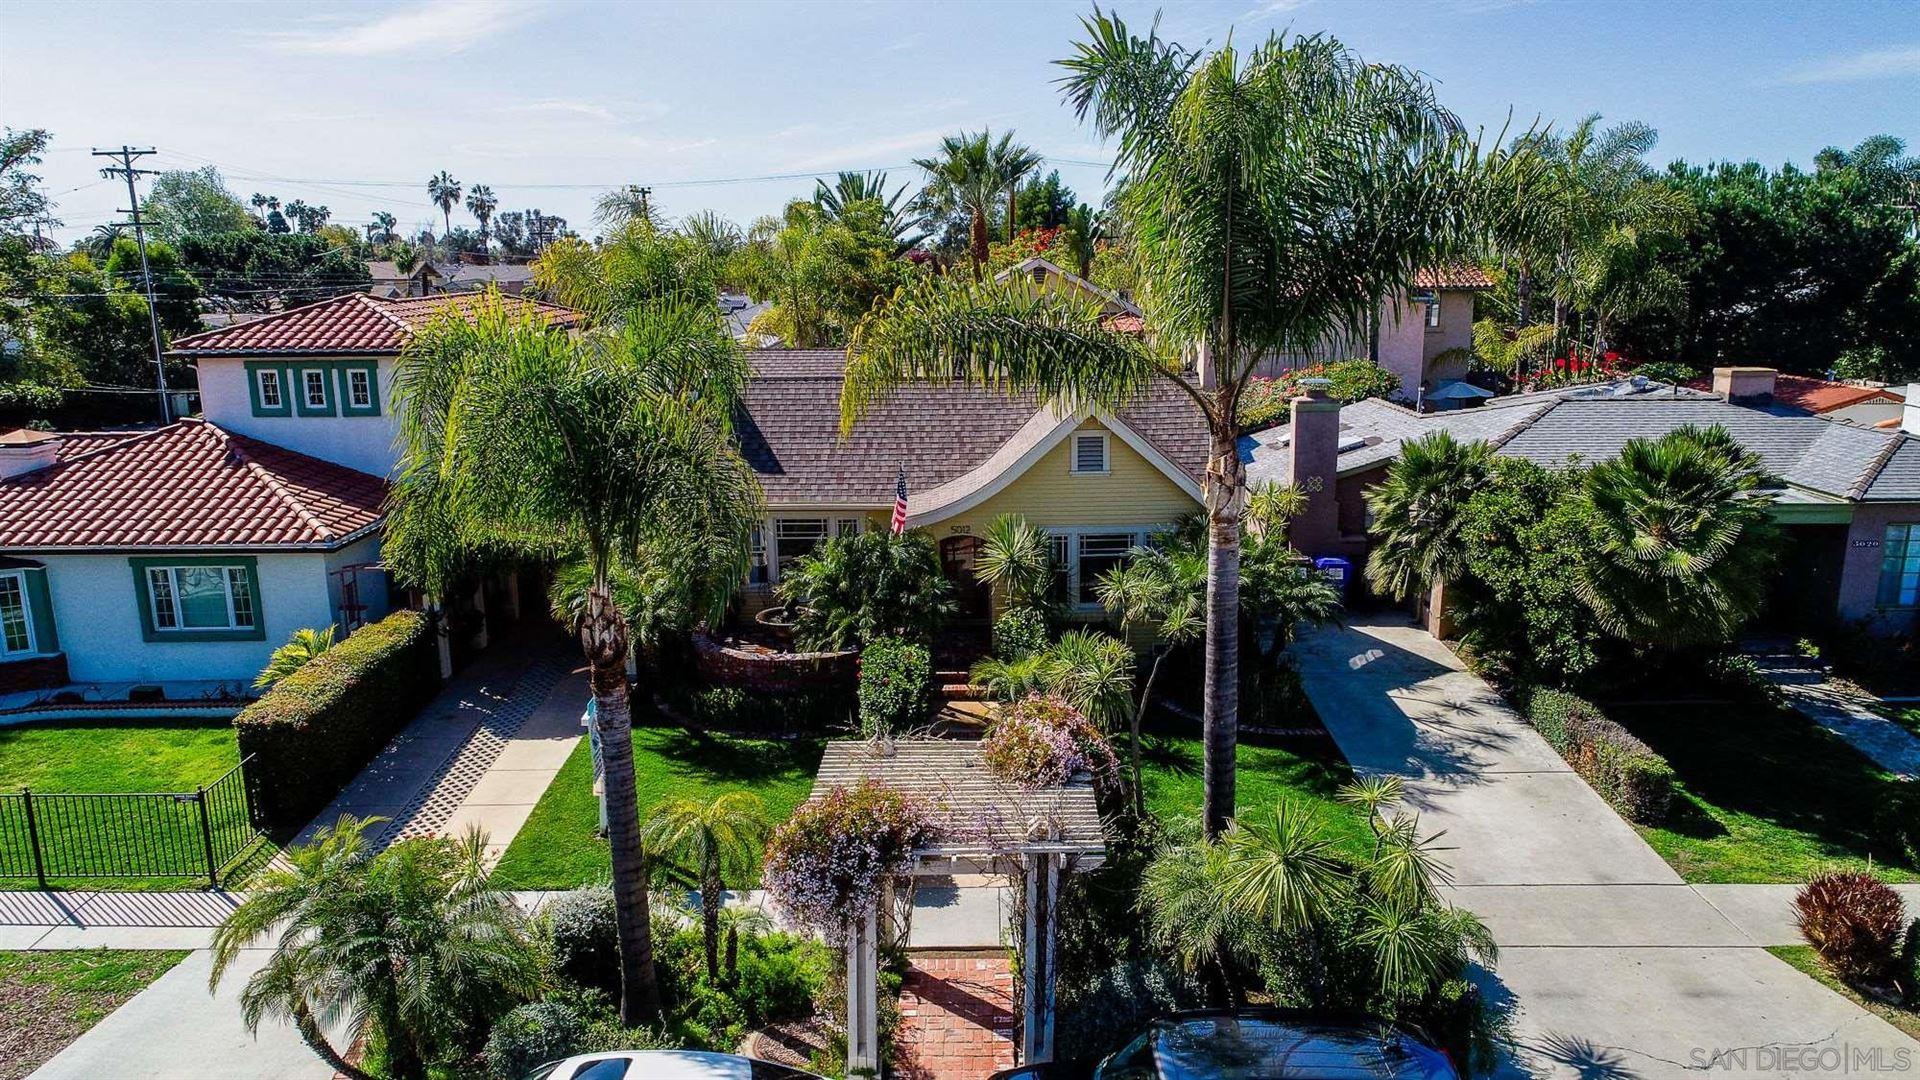 Photo of 5012 Hawley Blvd, San Diego, CA 92116 (MLS # 210005795)